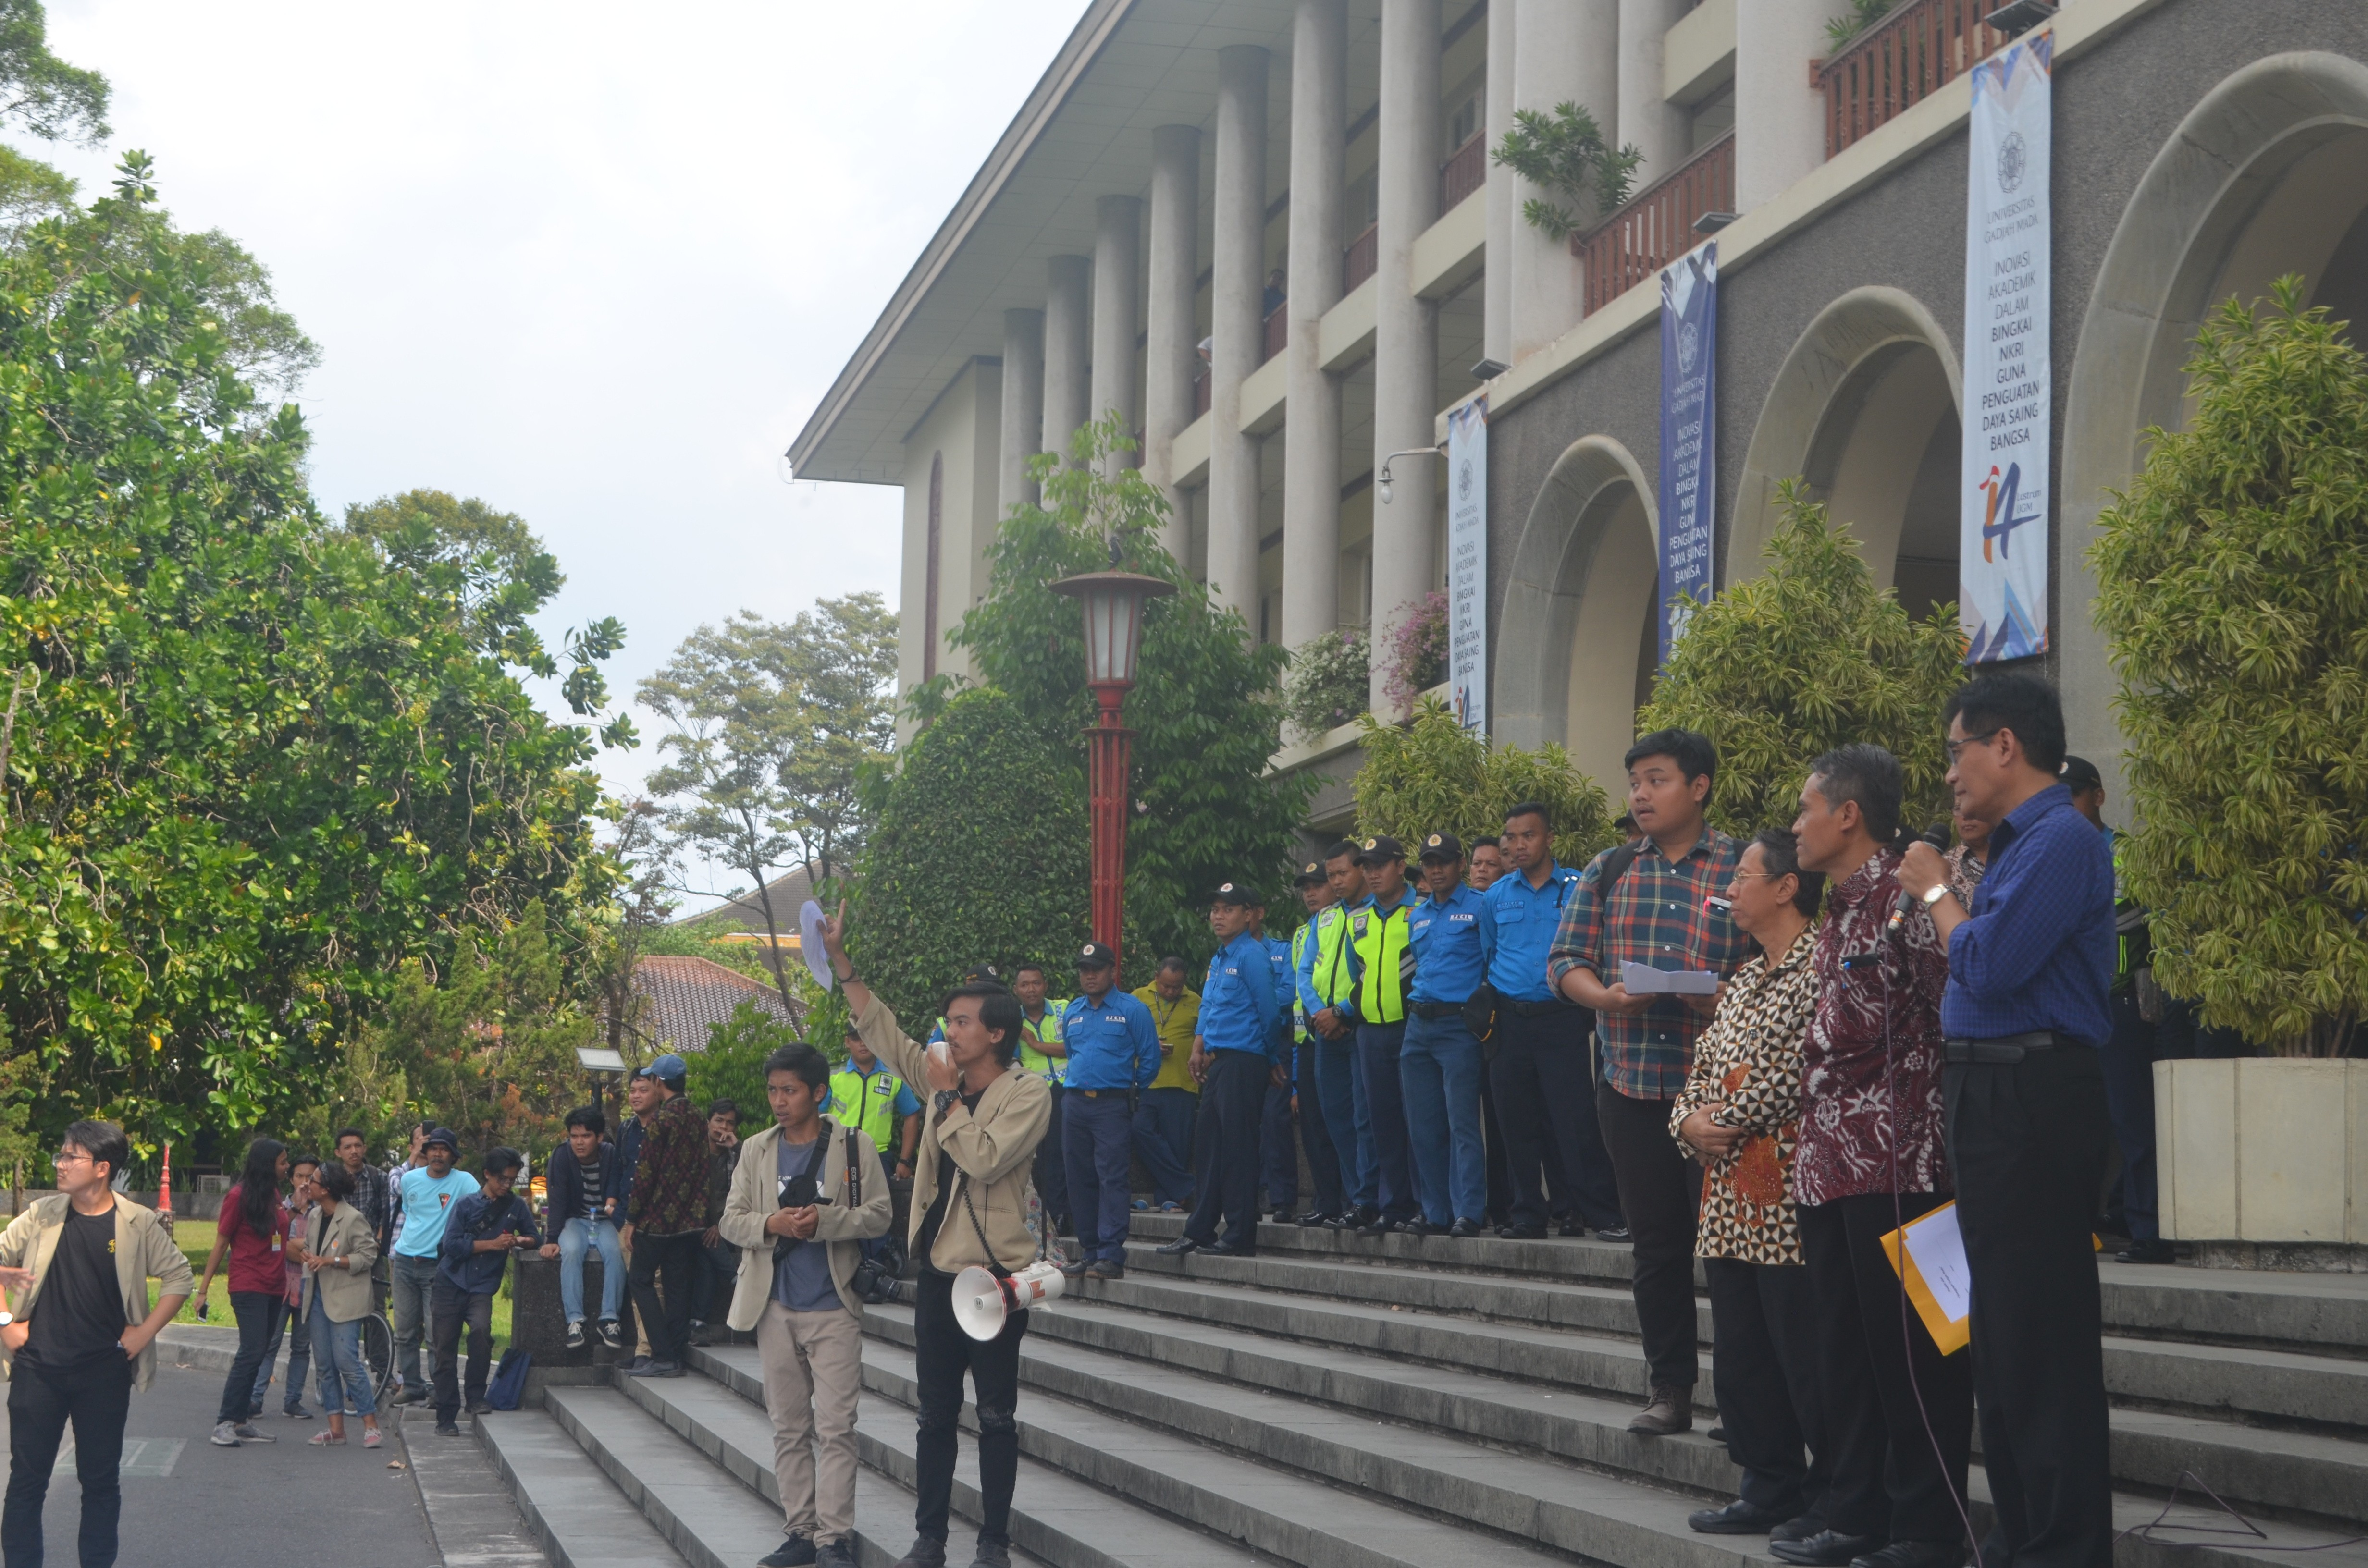 Menggugat Gadjah Mada:  Tujuh Tuntutan untuk Rektorat